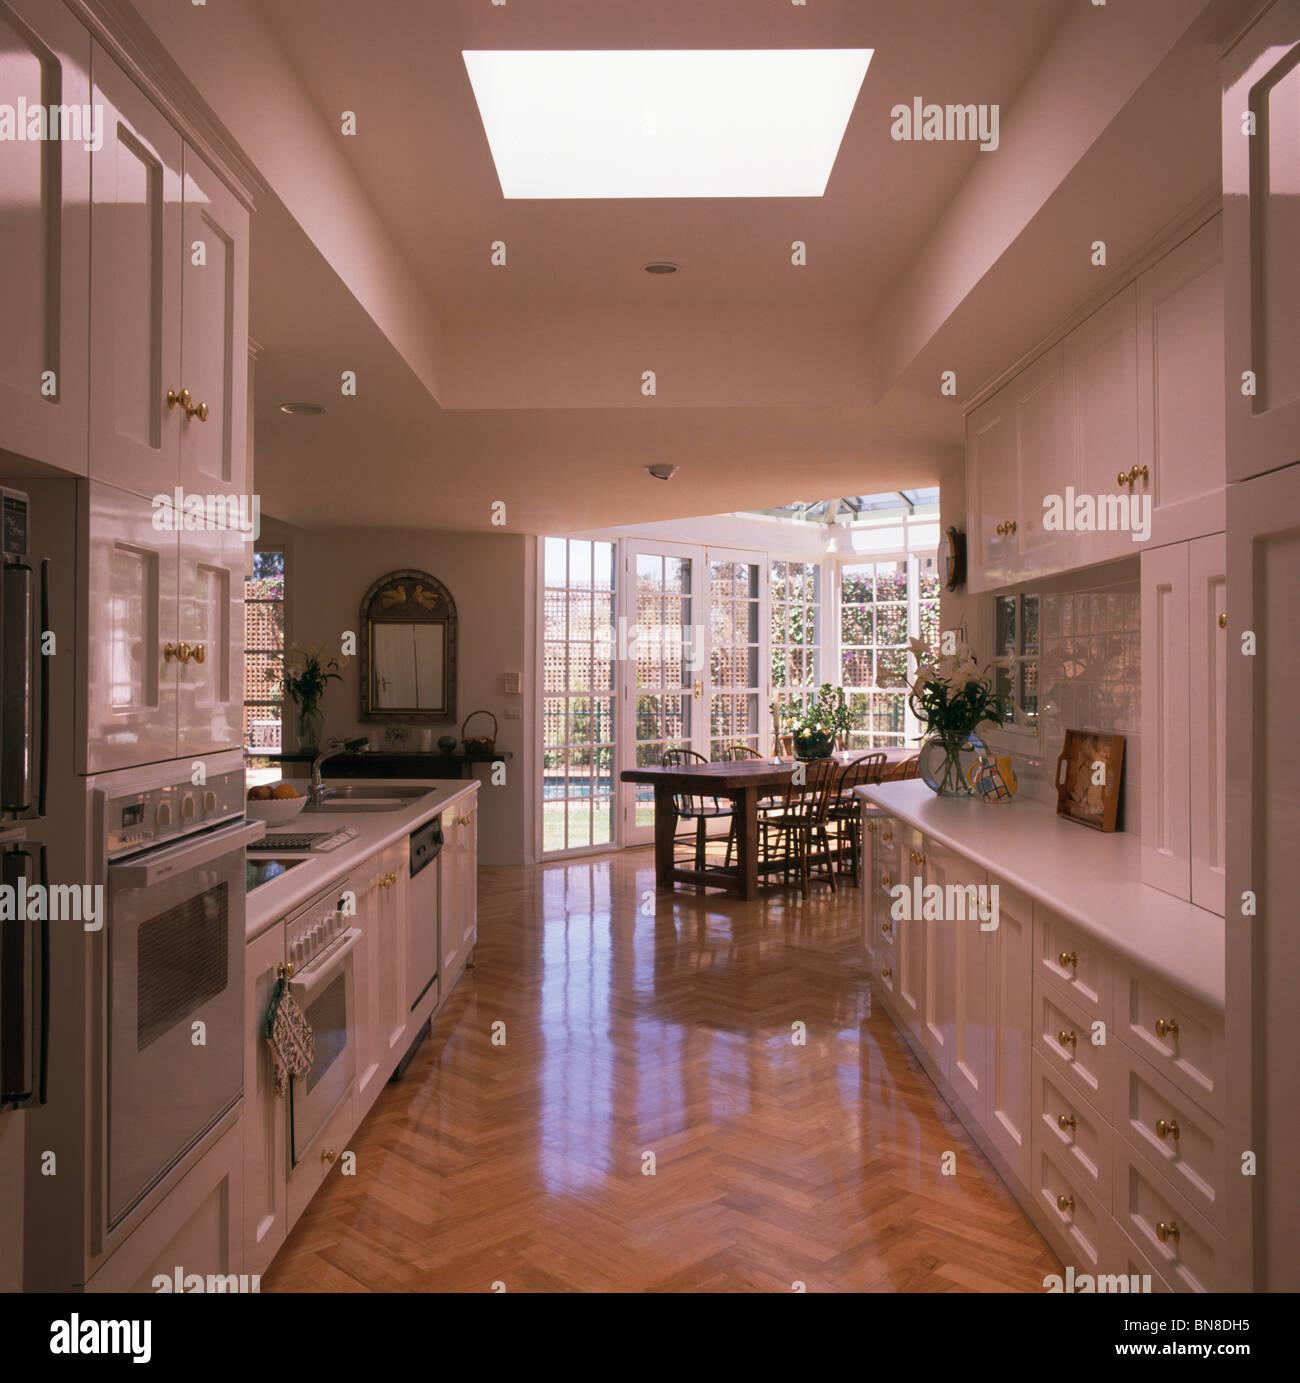 Wooden Parquet Flooring In Large Modern Galley Kitchen And